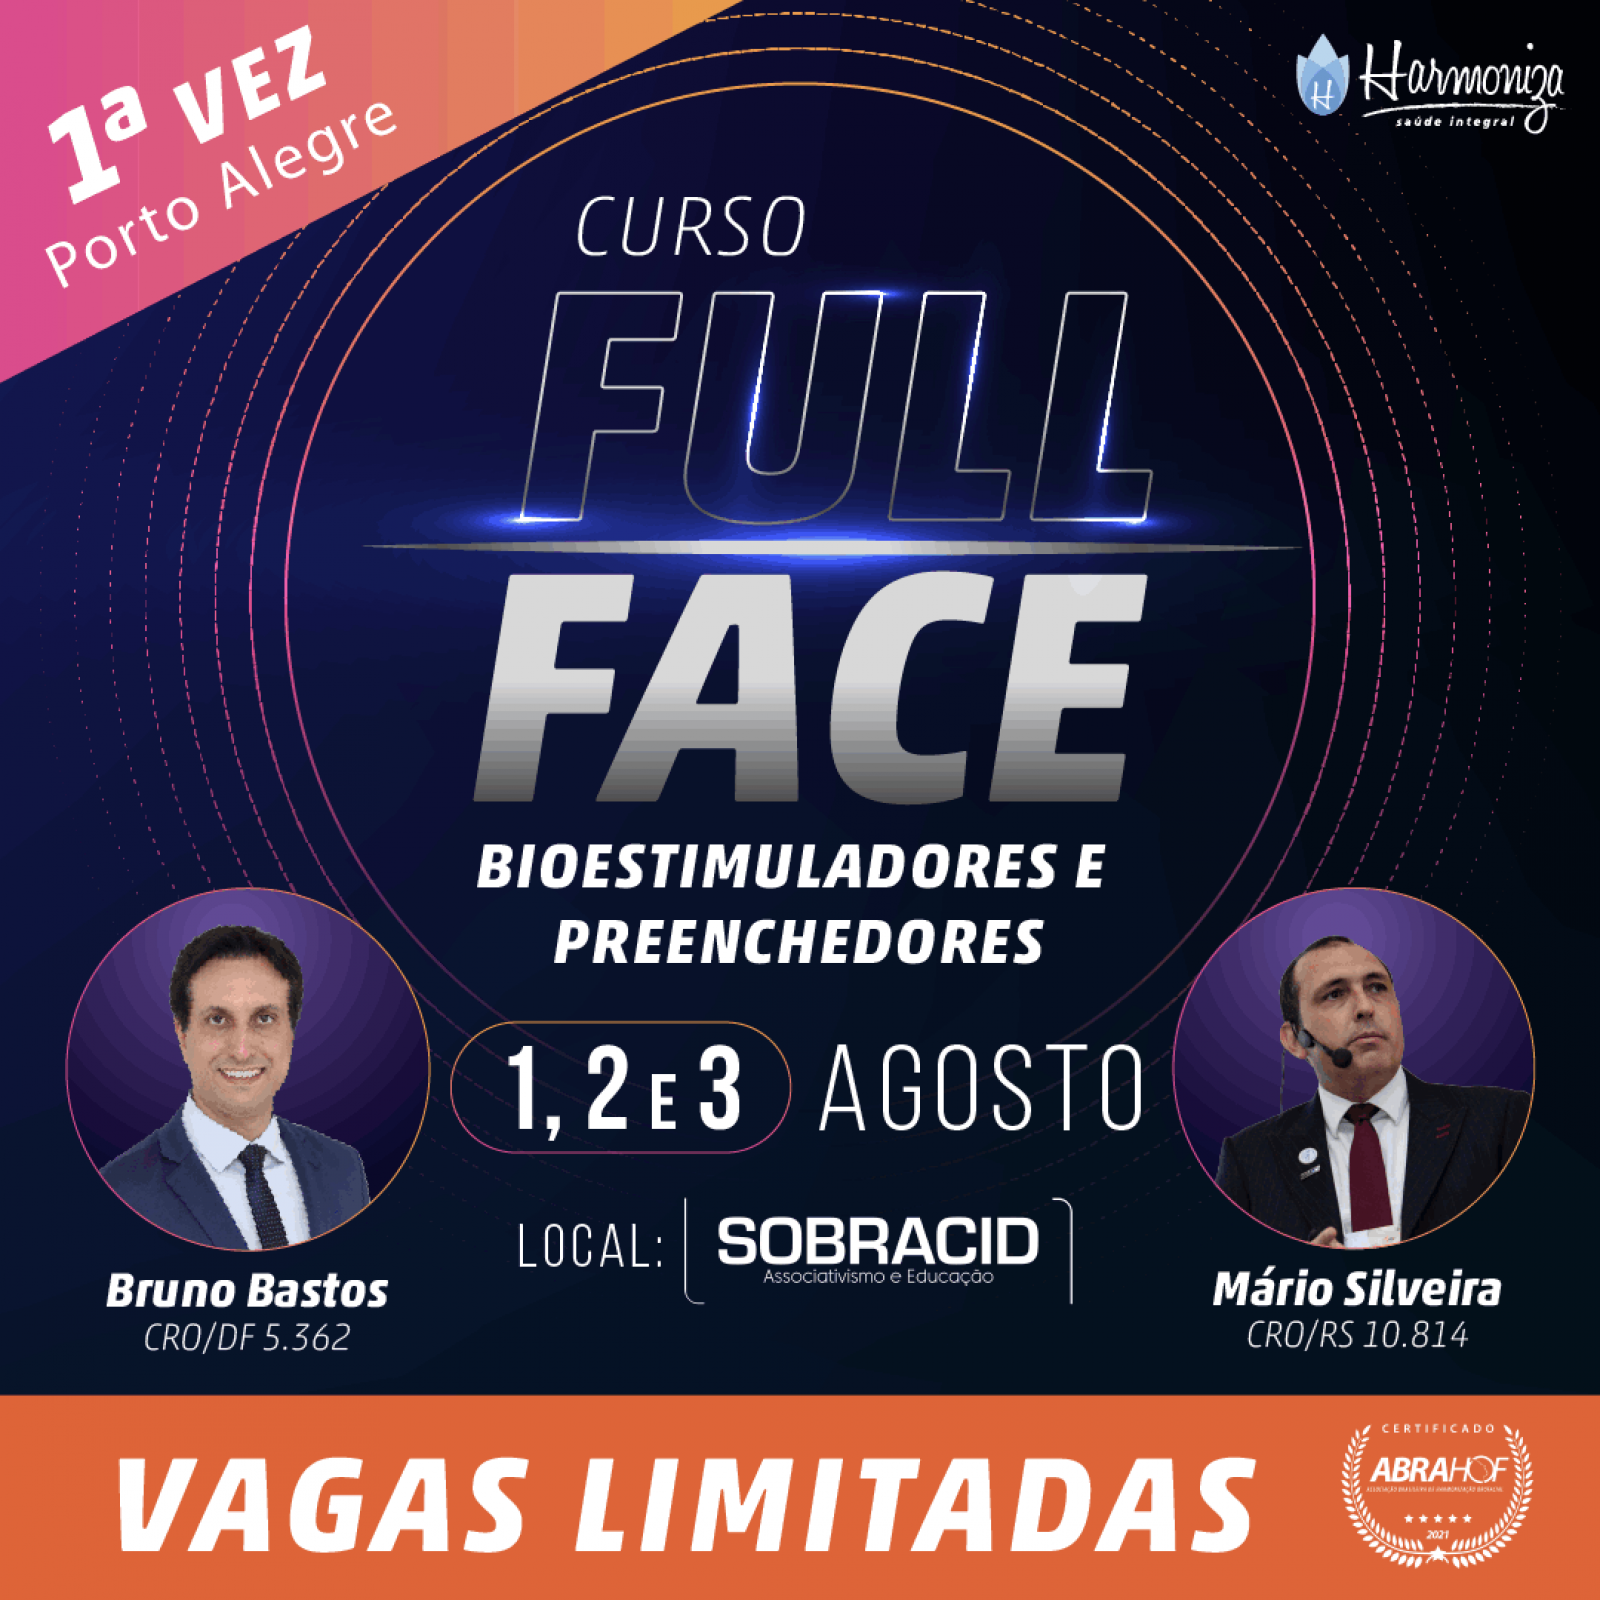 Full Face - Bioestimuladores e Preenchedores